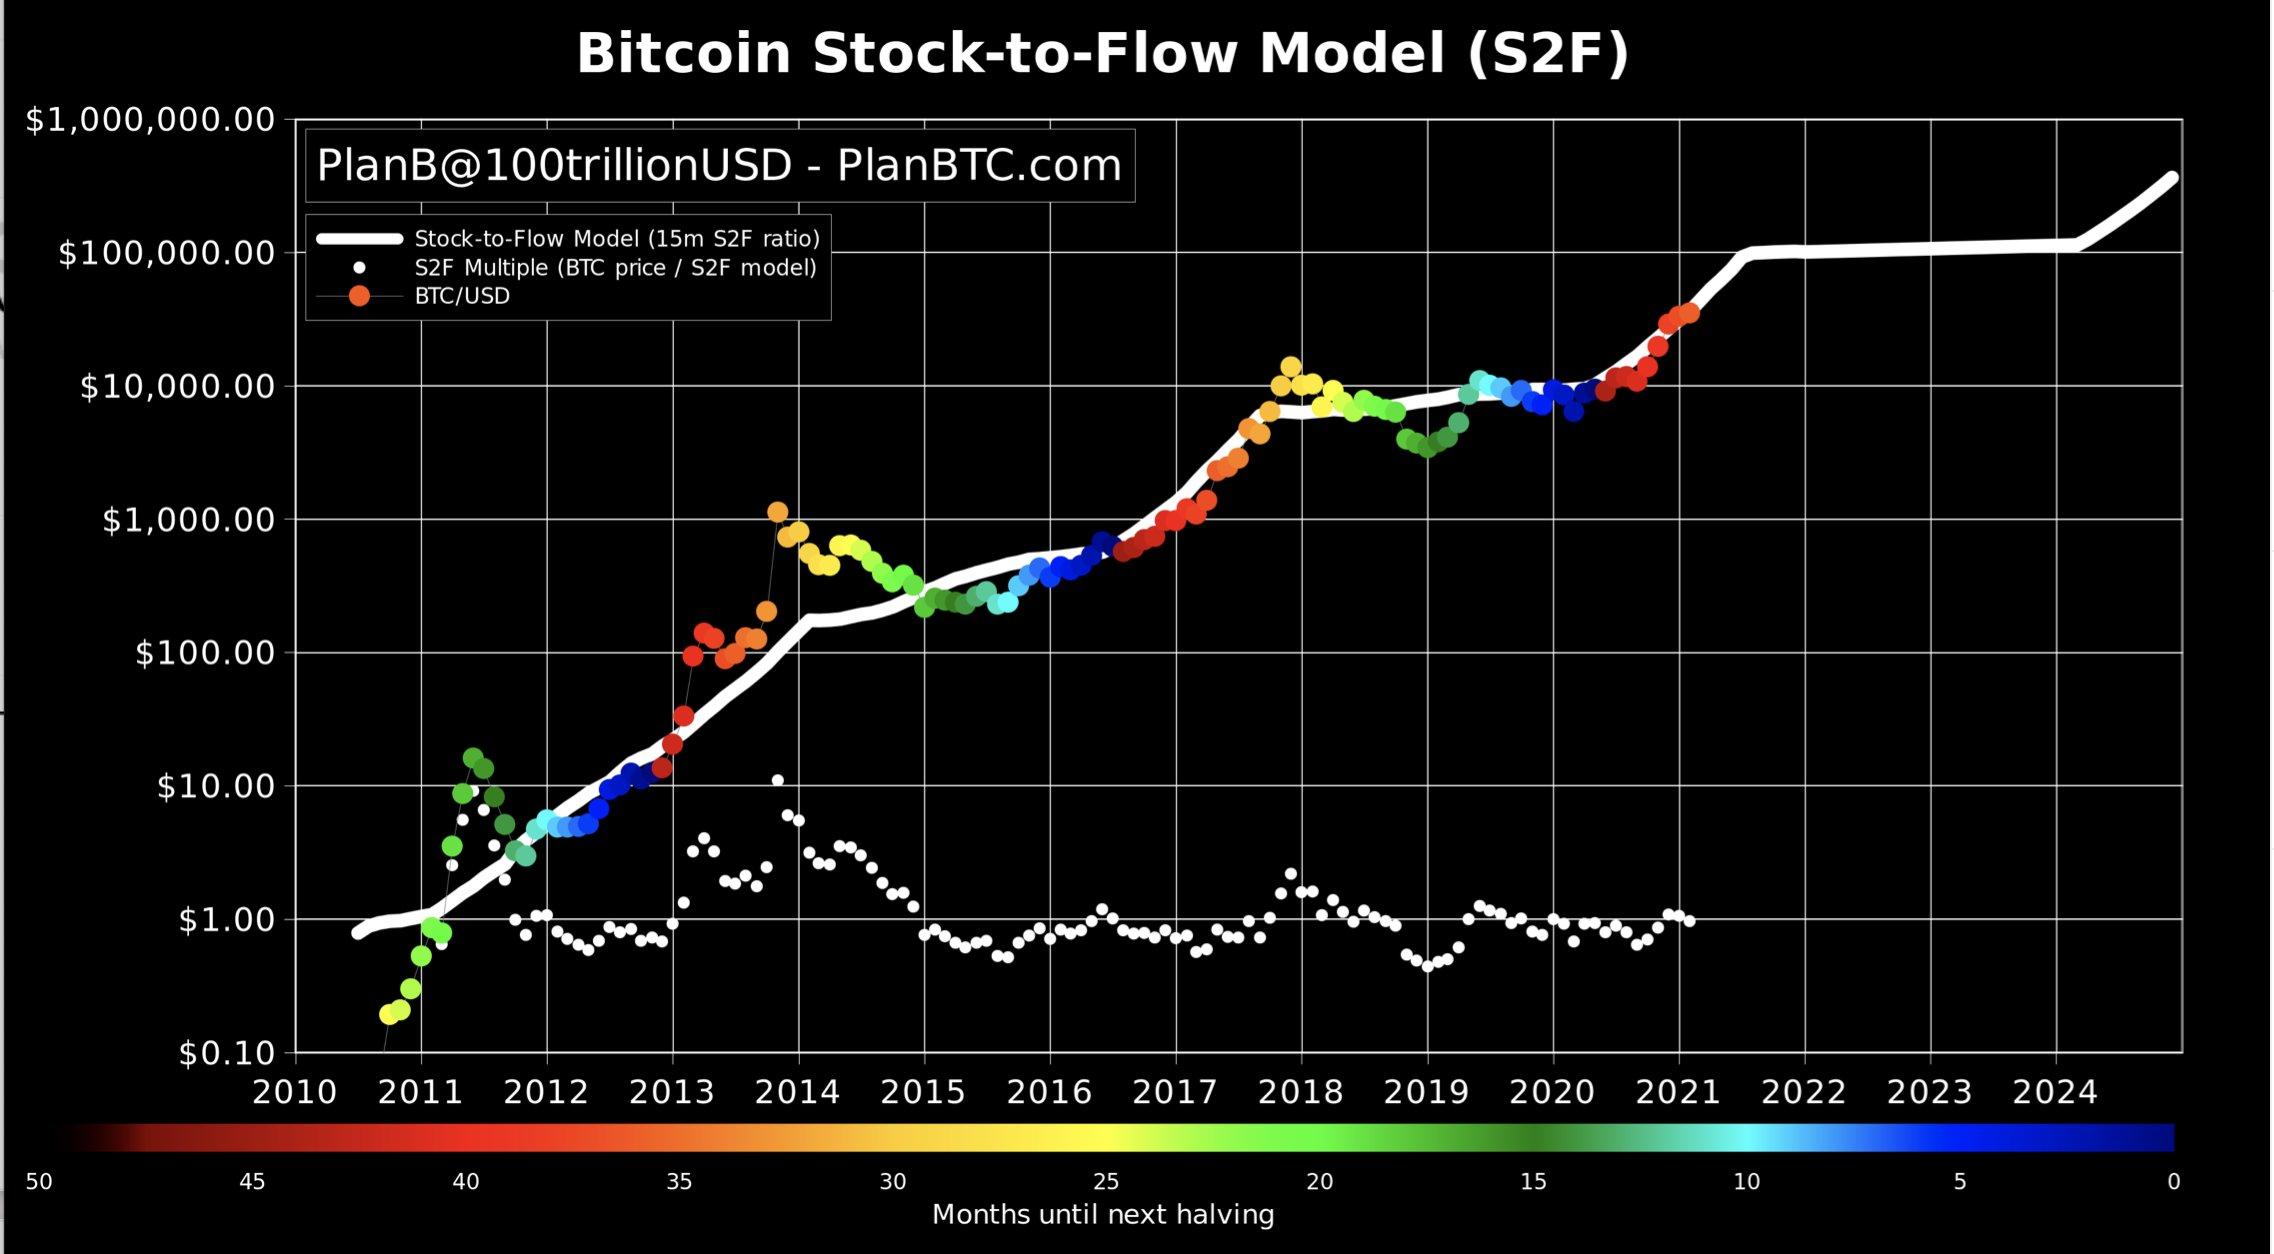 Bitcoin S2F model